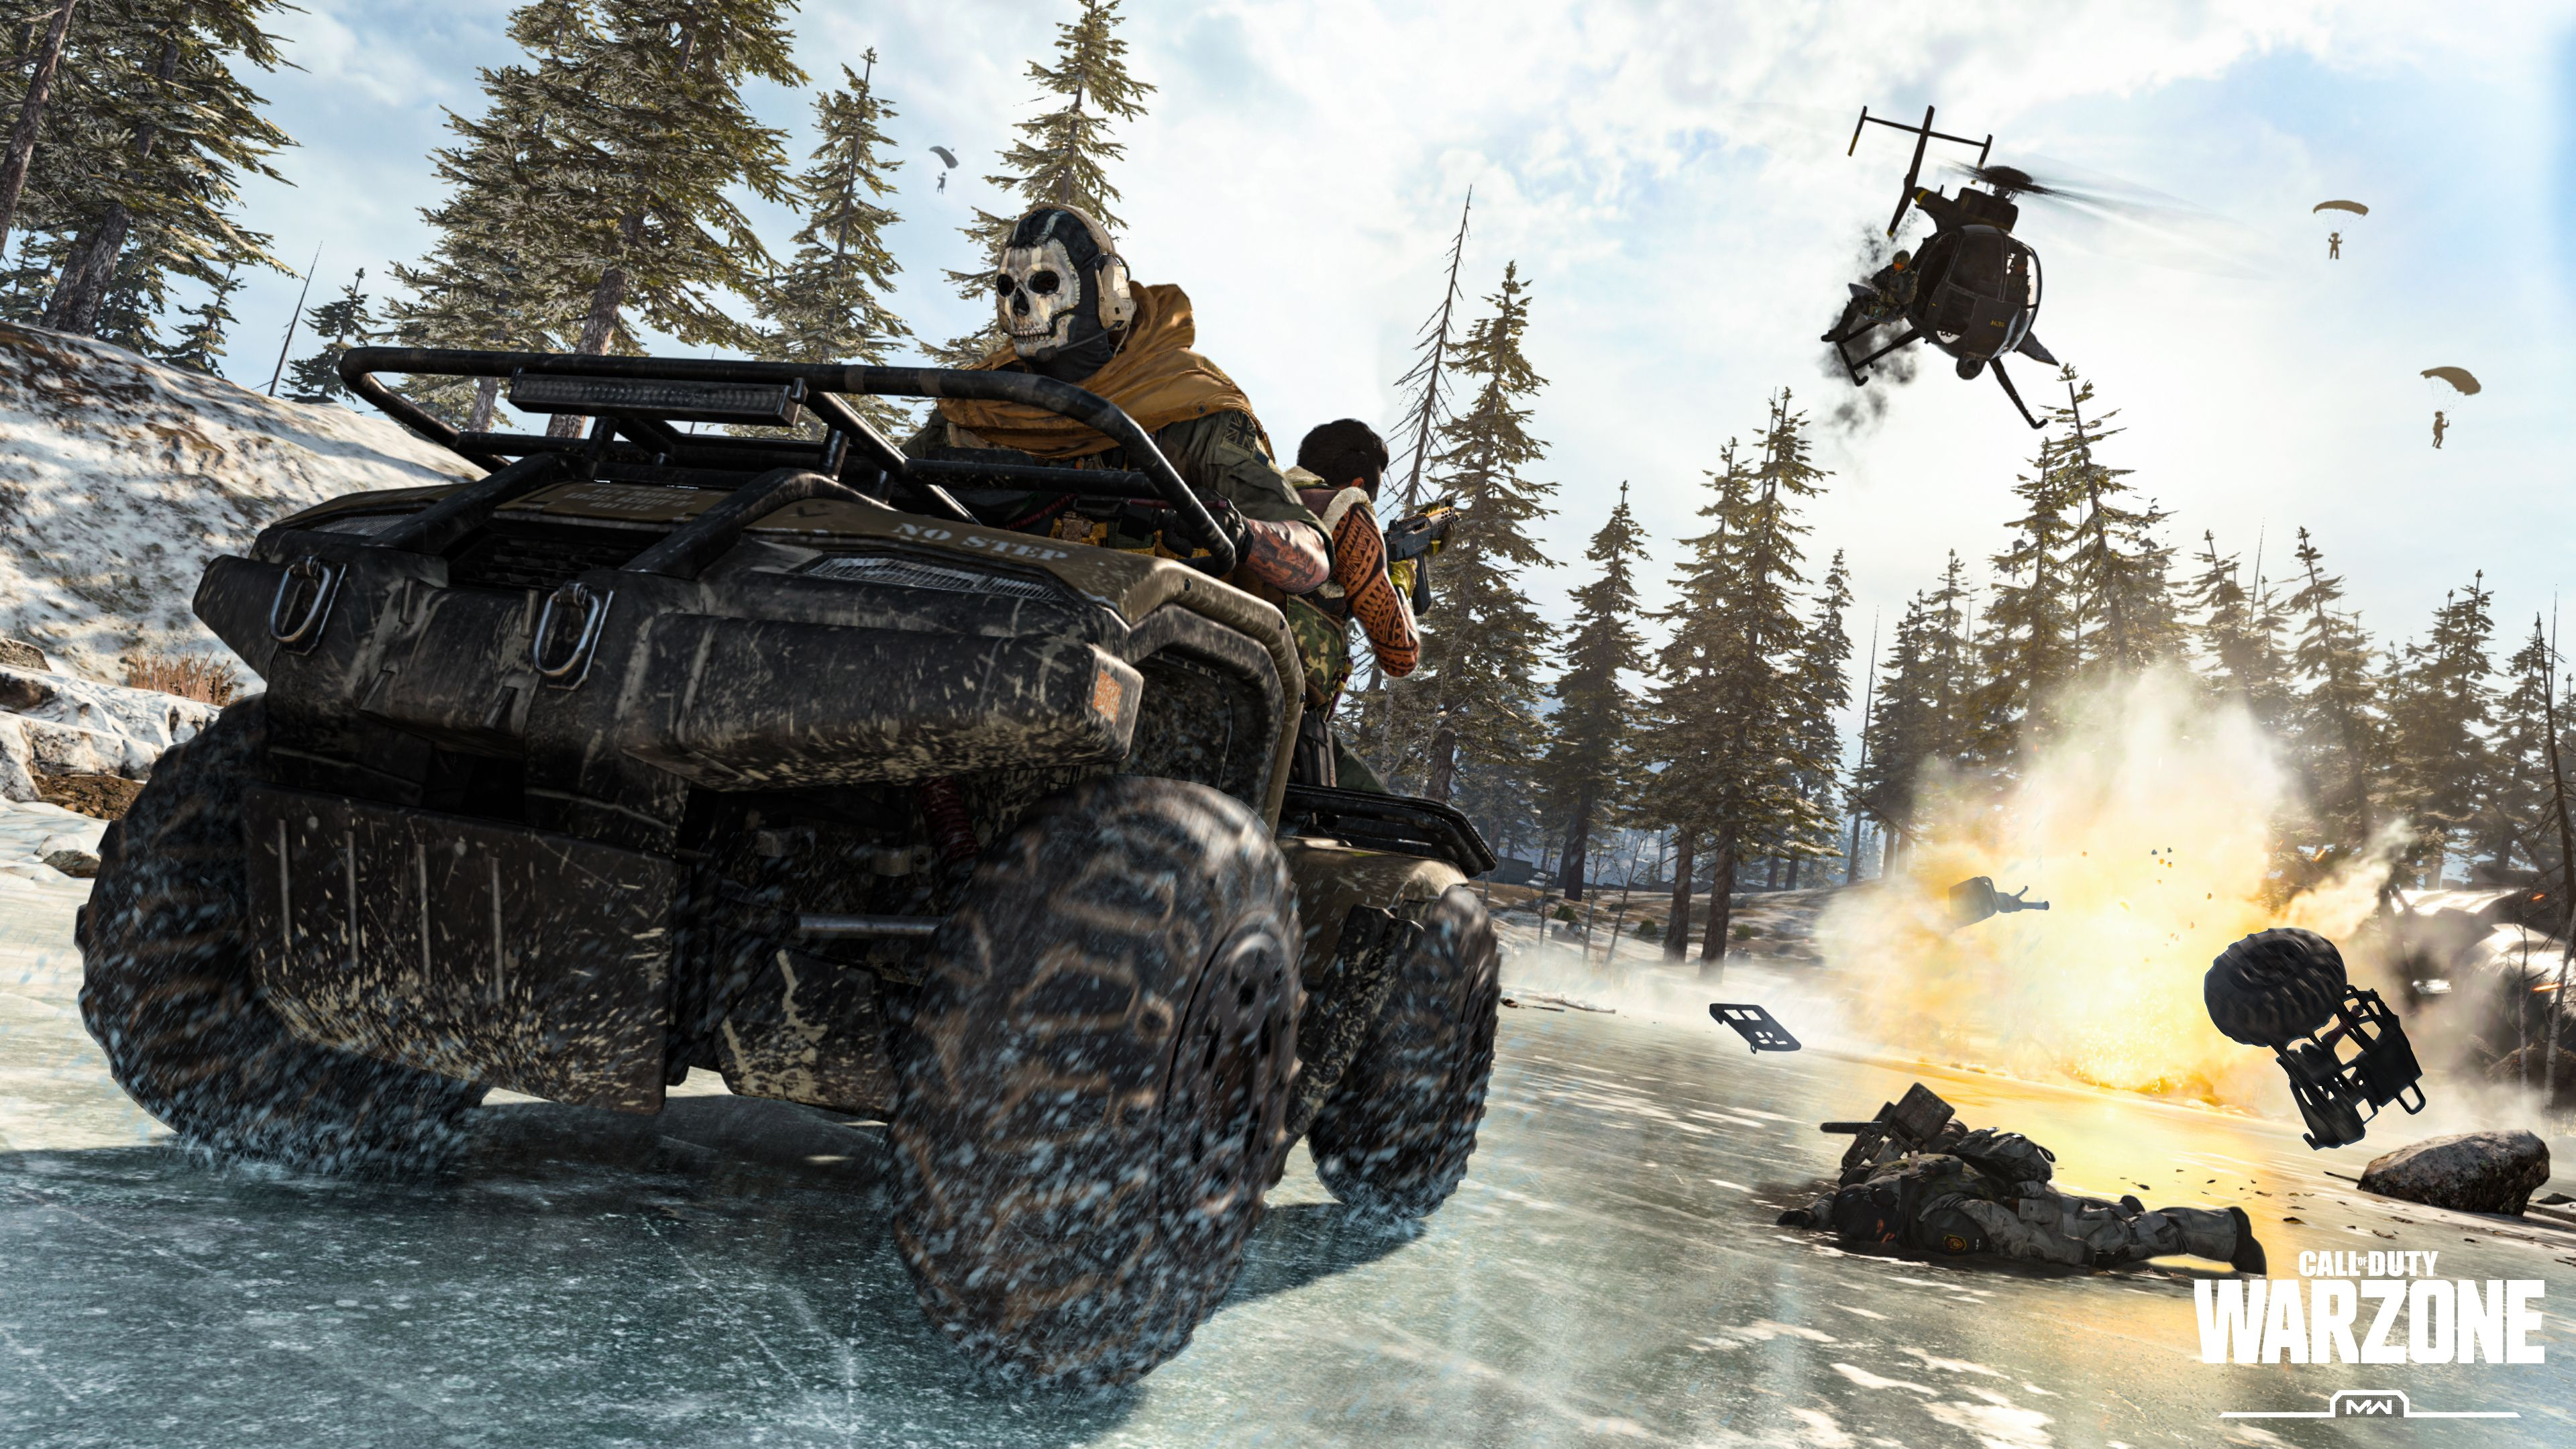 Состоялся официальный анонс баттл-рояля Call of Duty: Modern Warfare